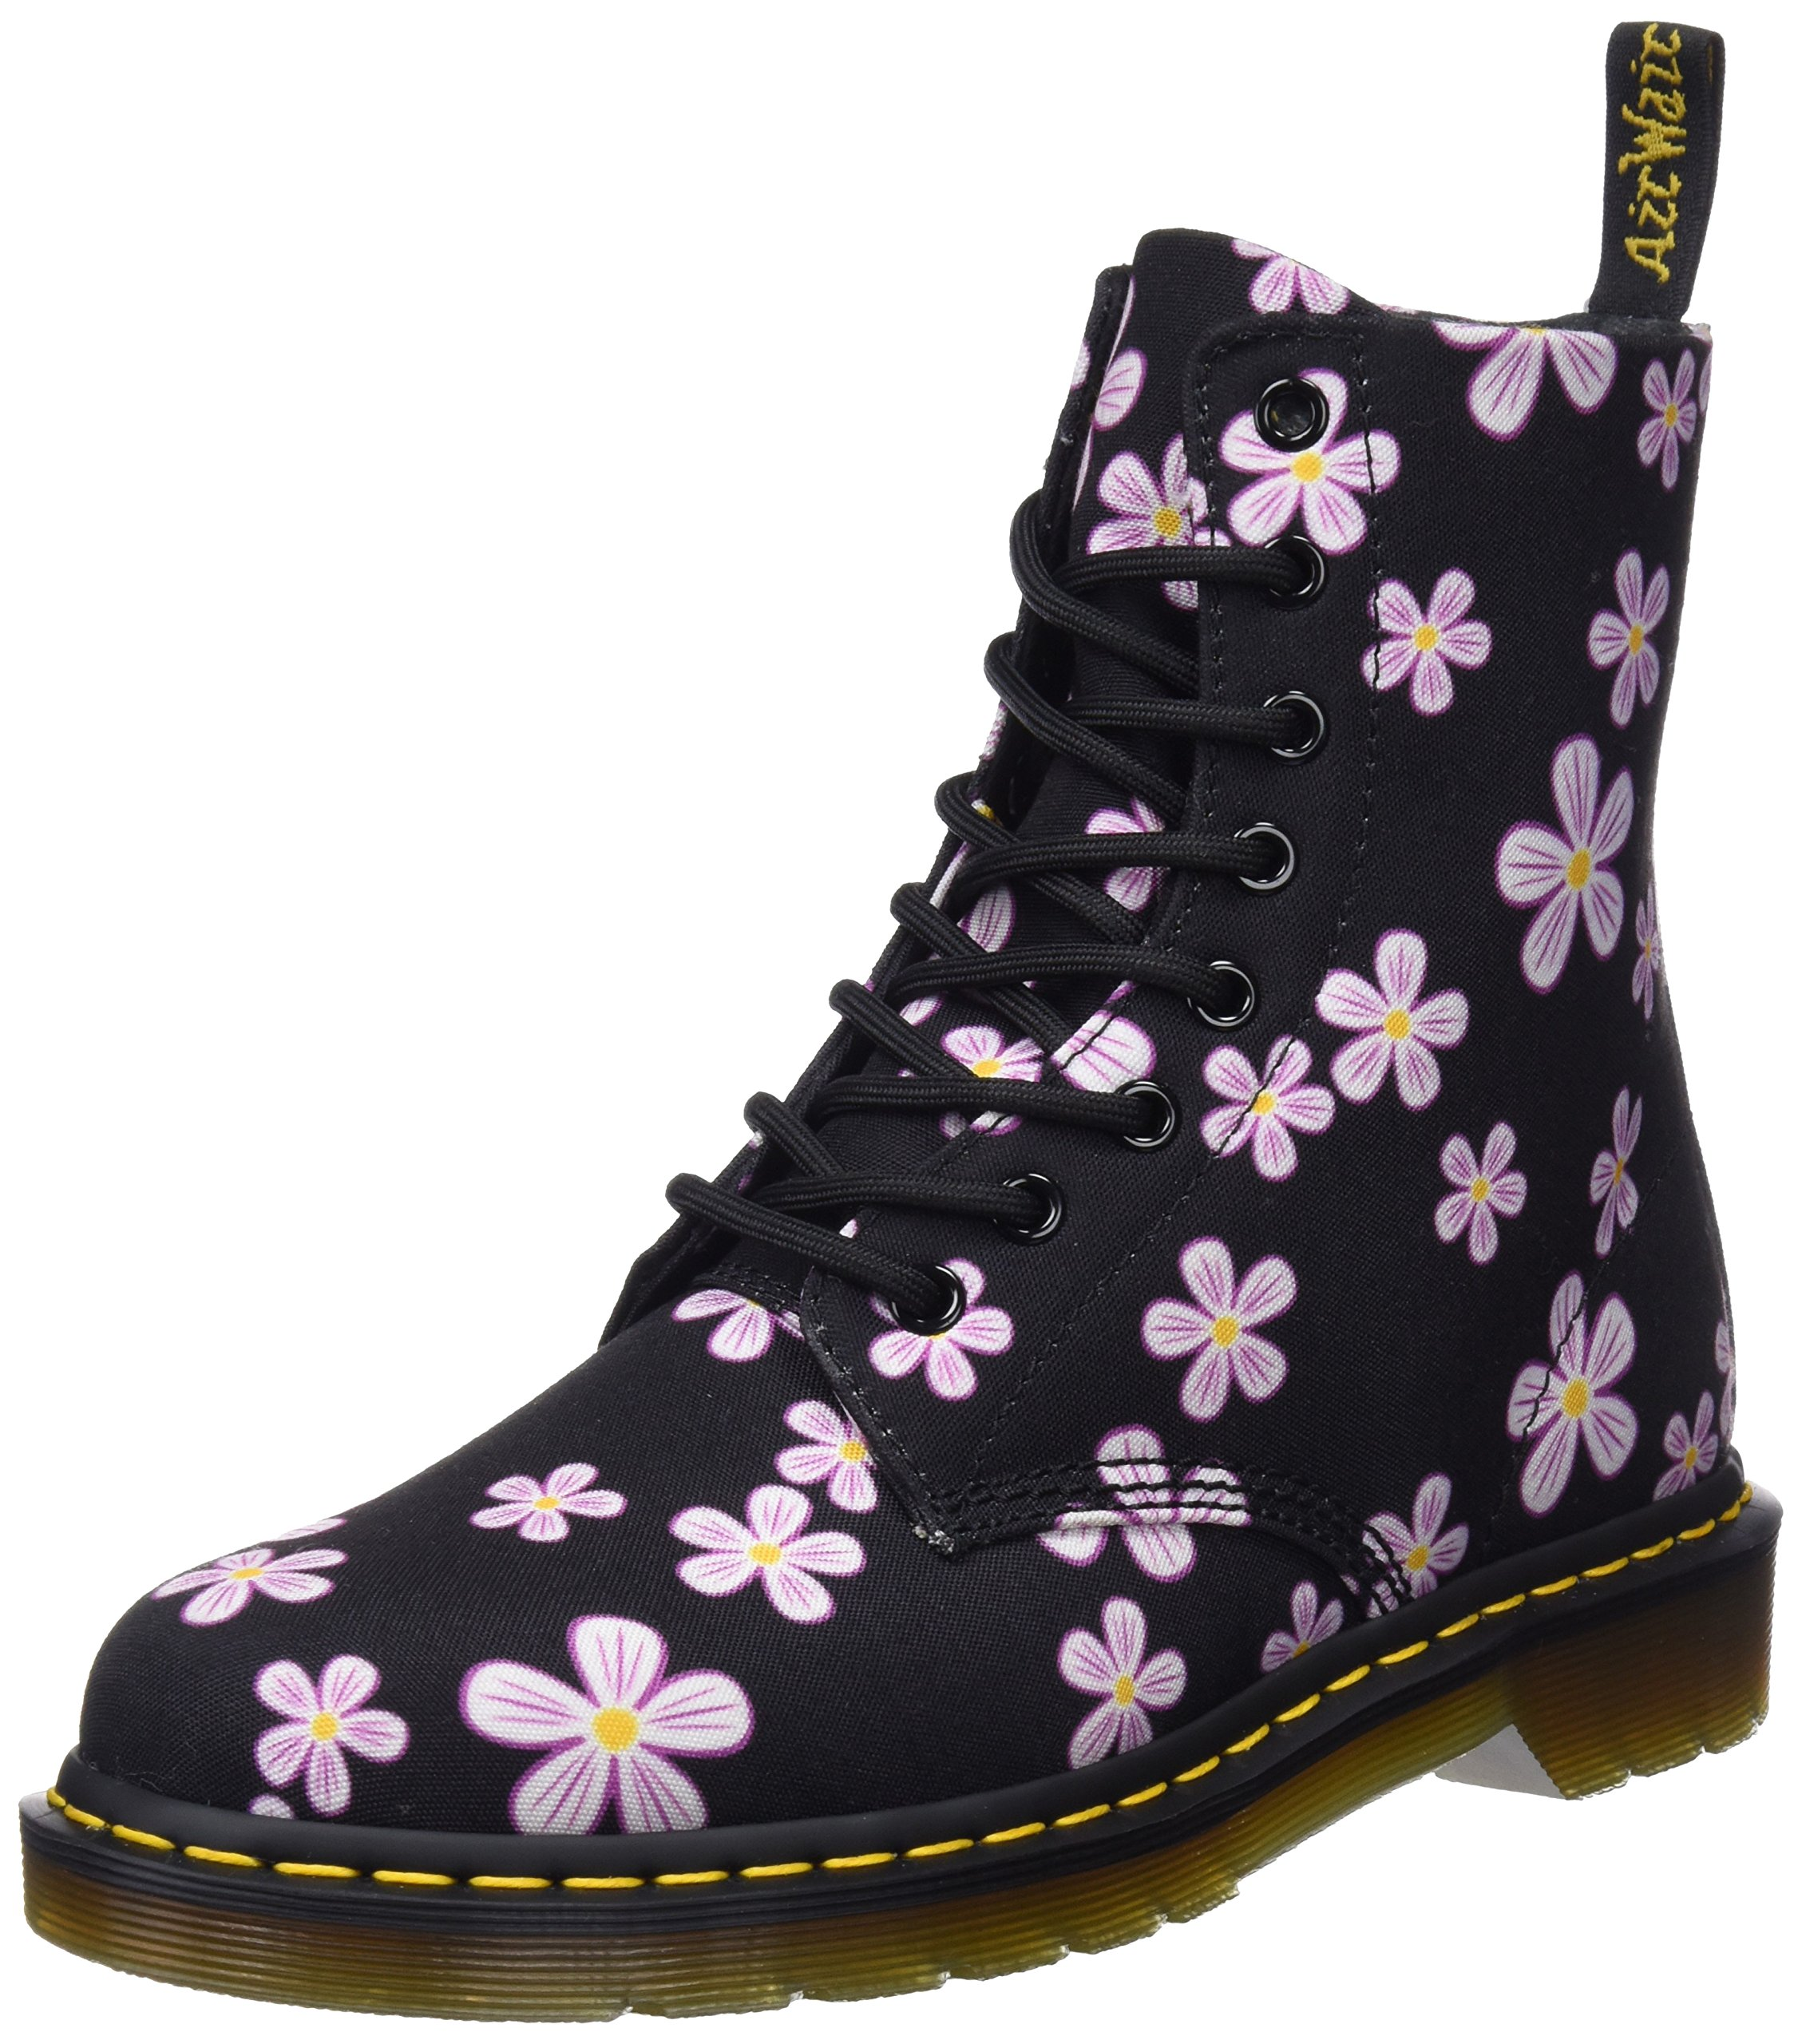 Dr. Martens Women's Page,Black Meadow Flowers,7 M UK (9 US)